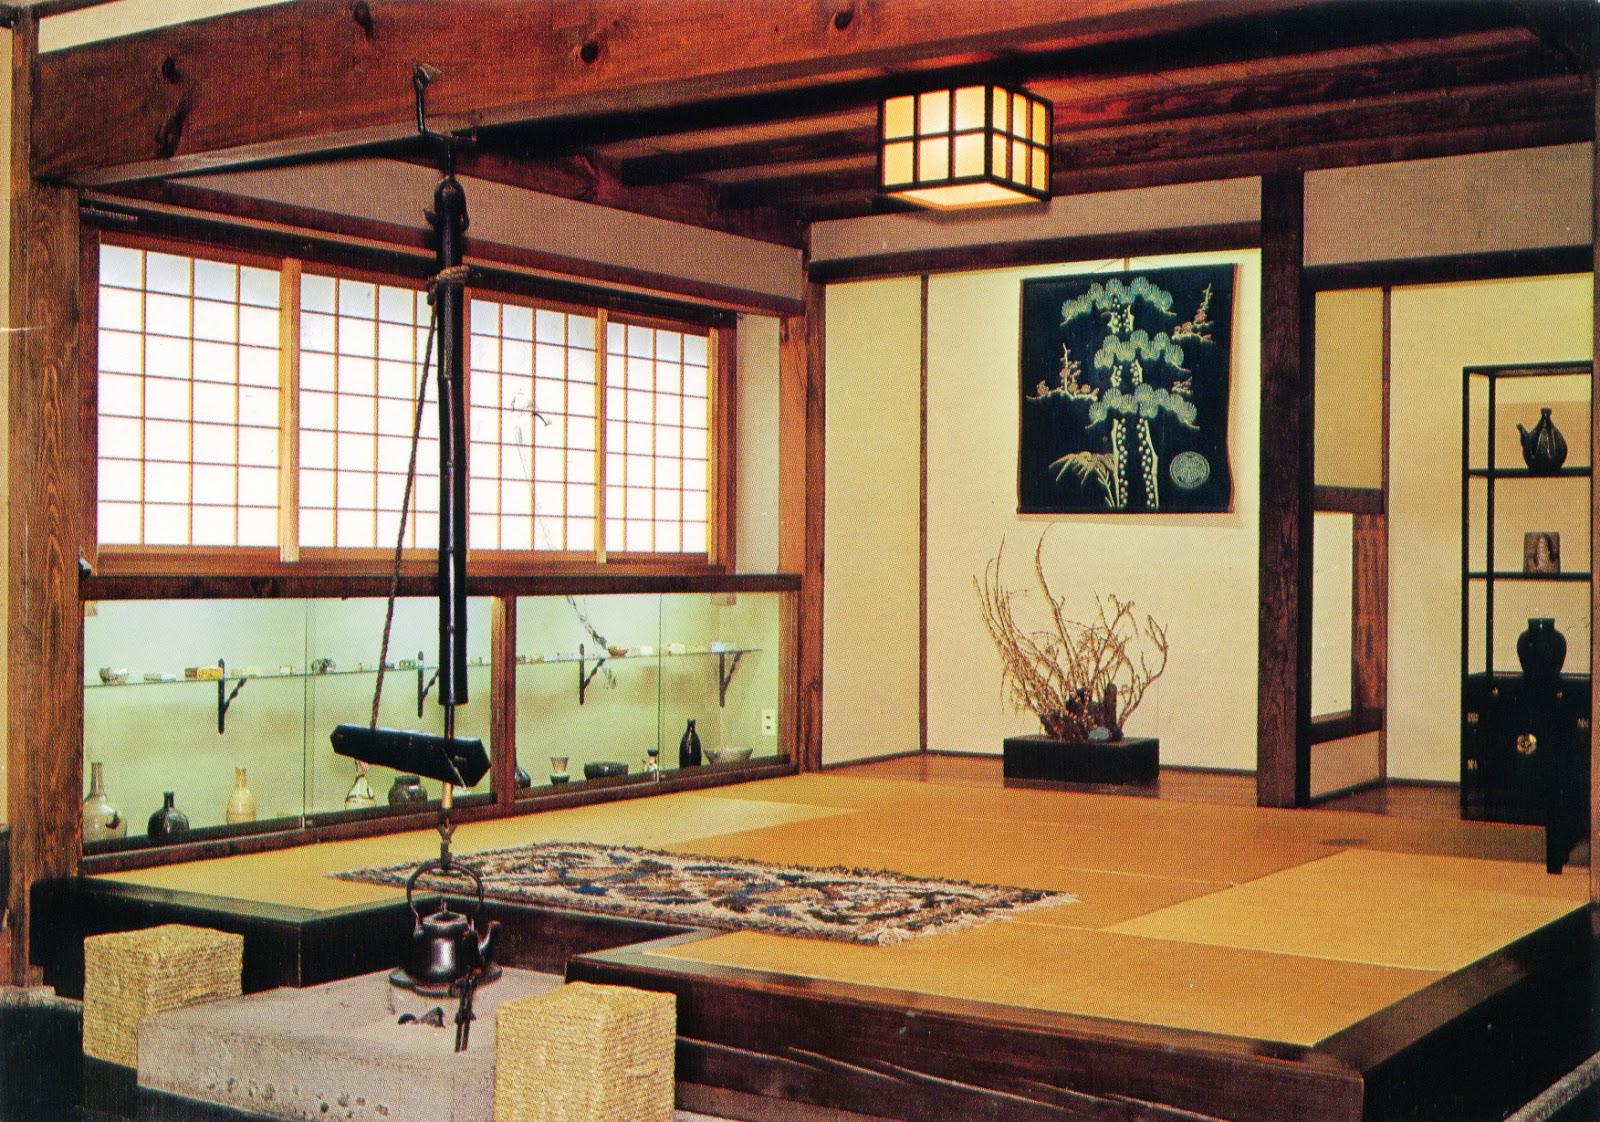 Ancient japanese castles interior 0769, 0770 japan (chūgoku)